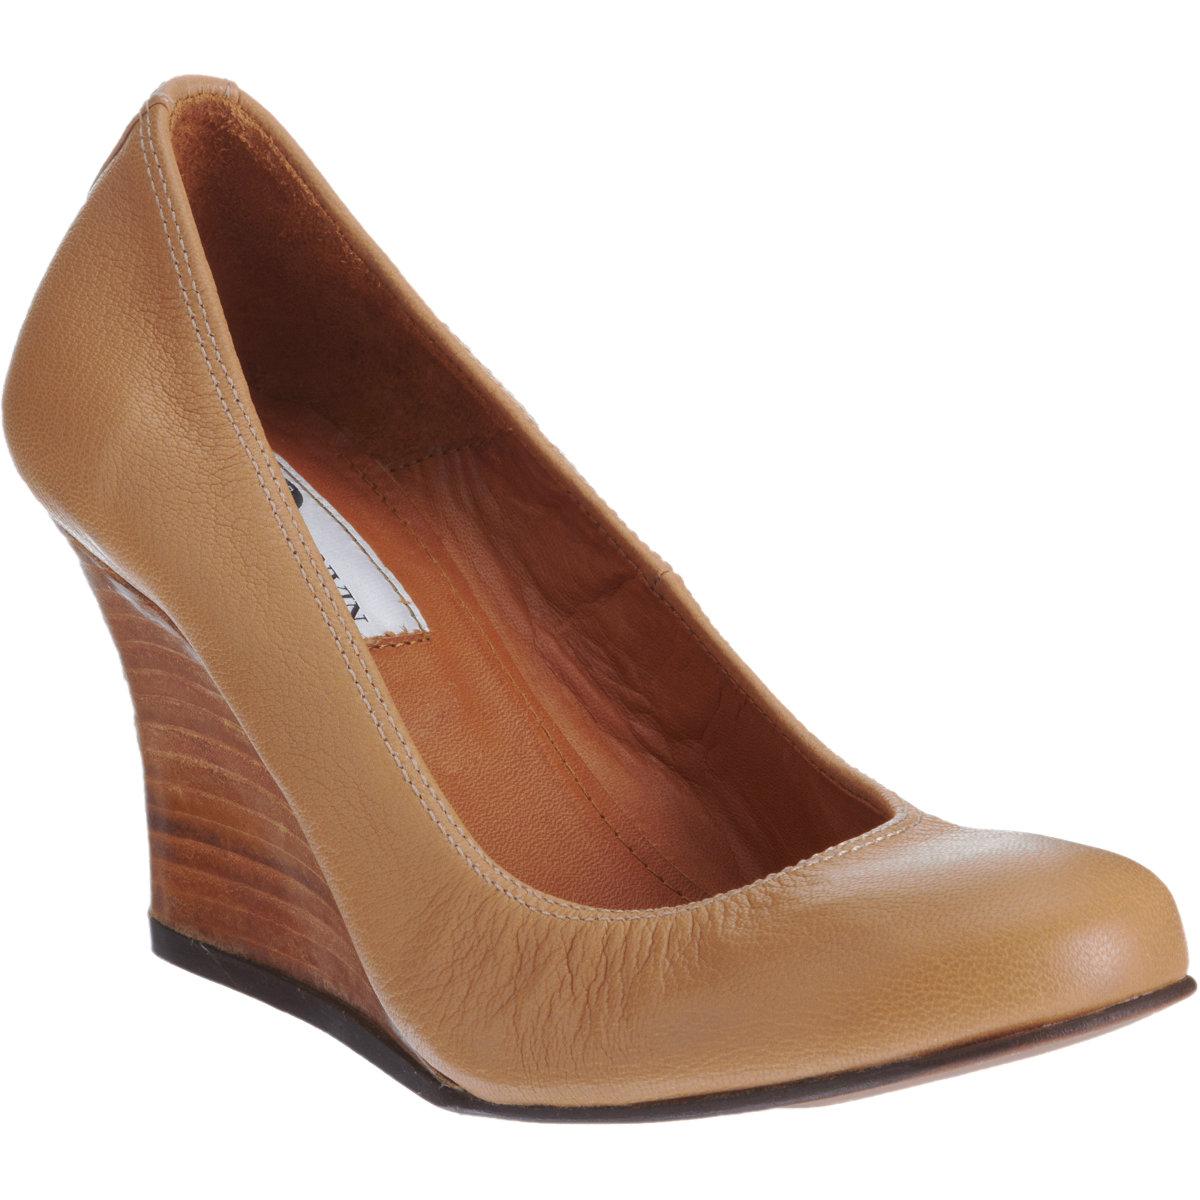 Barneys Womens Shoes